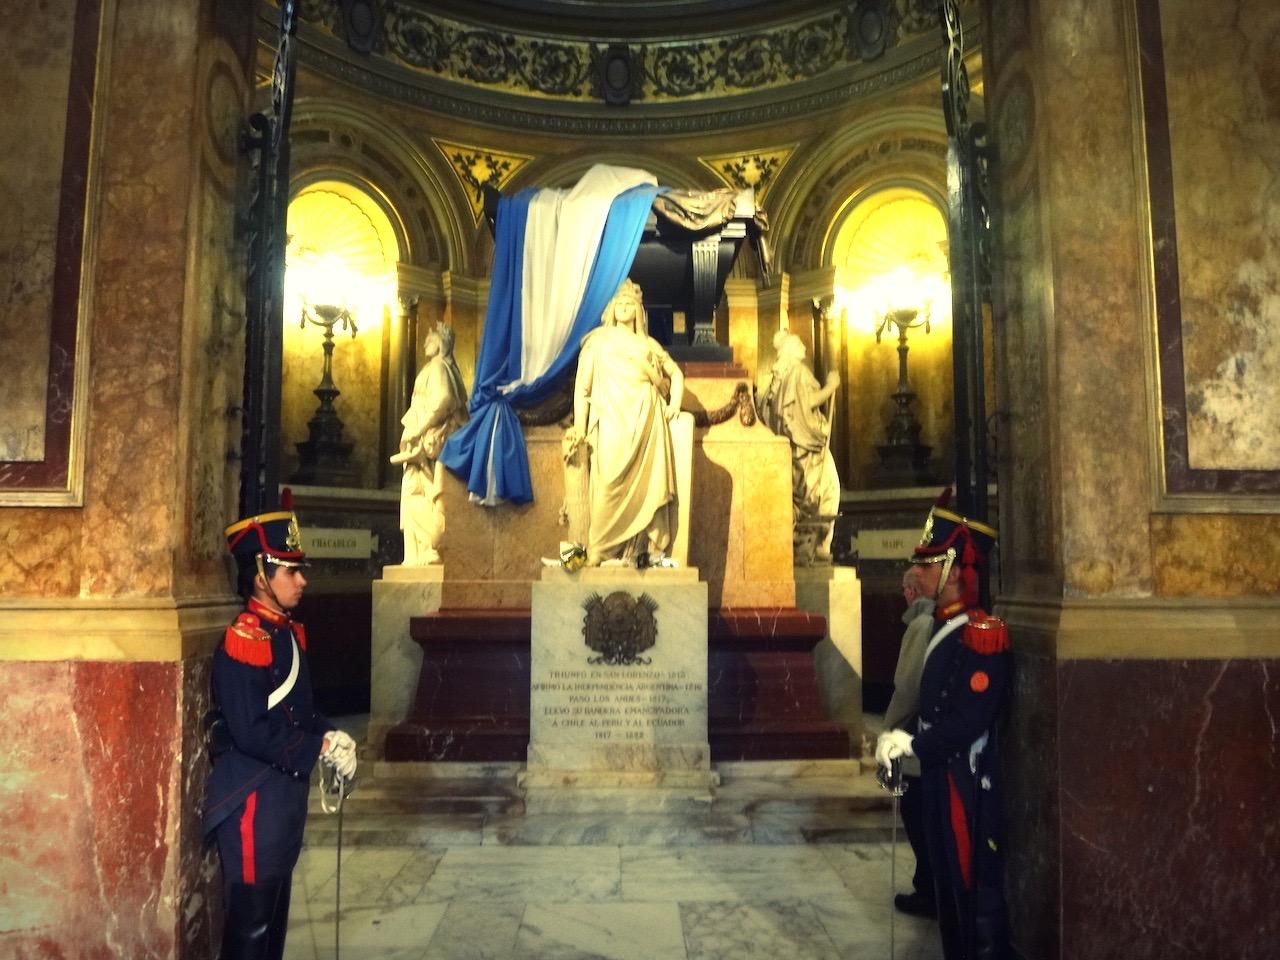 Mausoleum of the hero San Martin